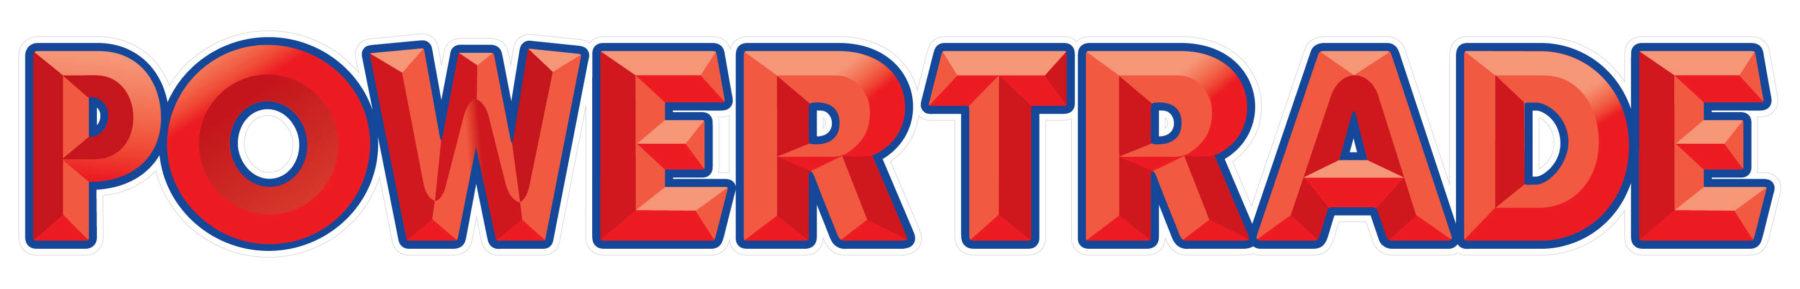 Powertrade 3d bar logo